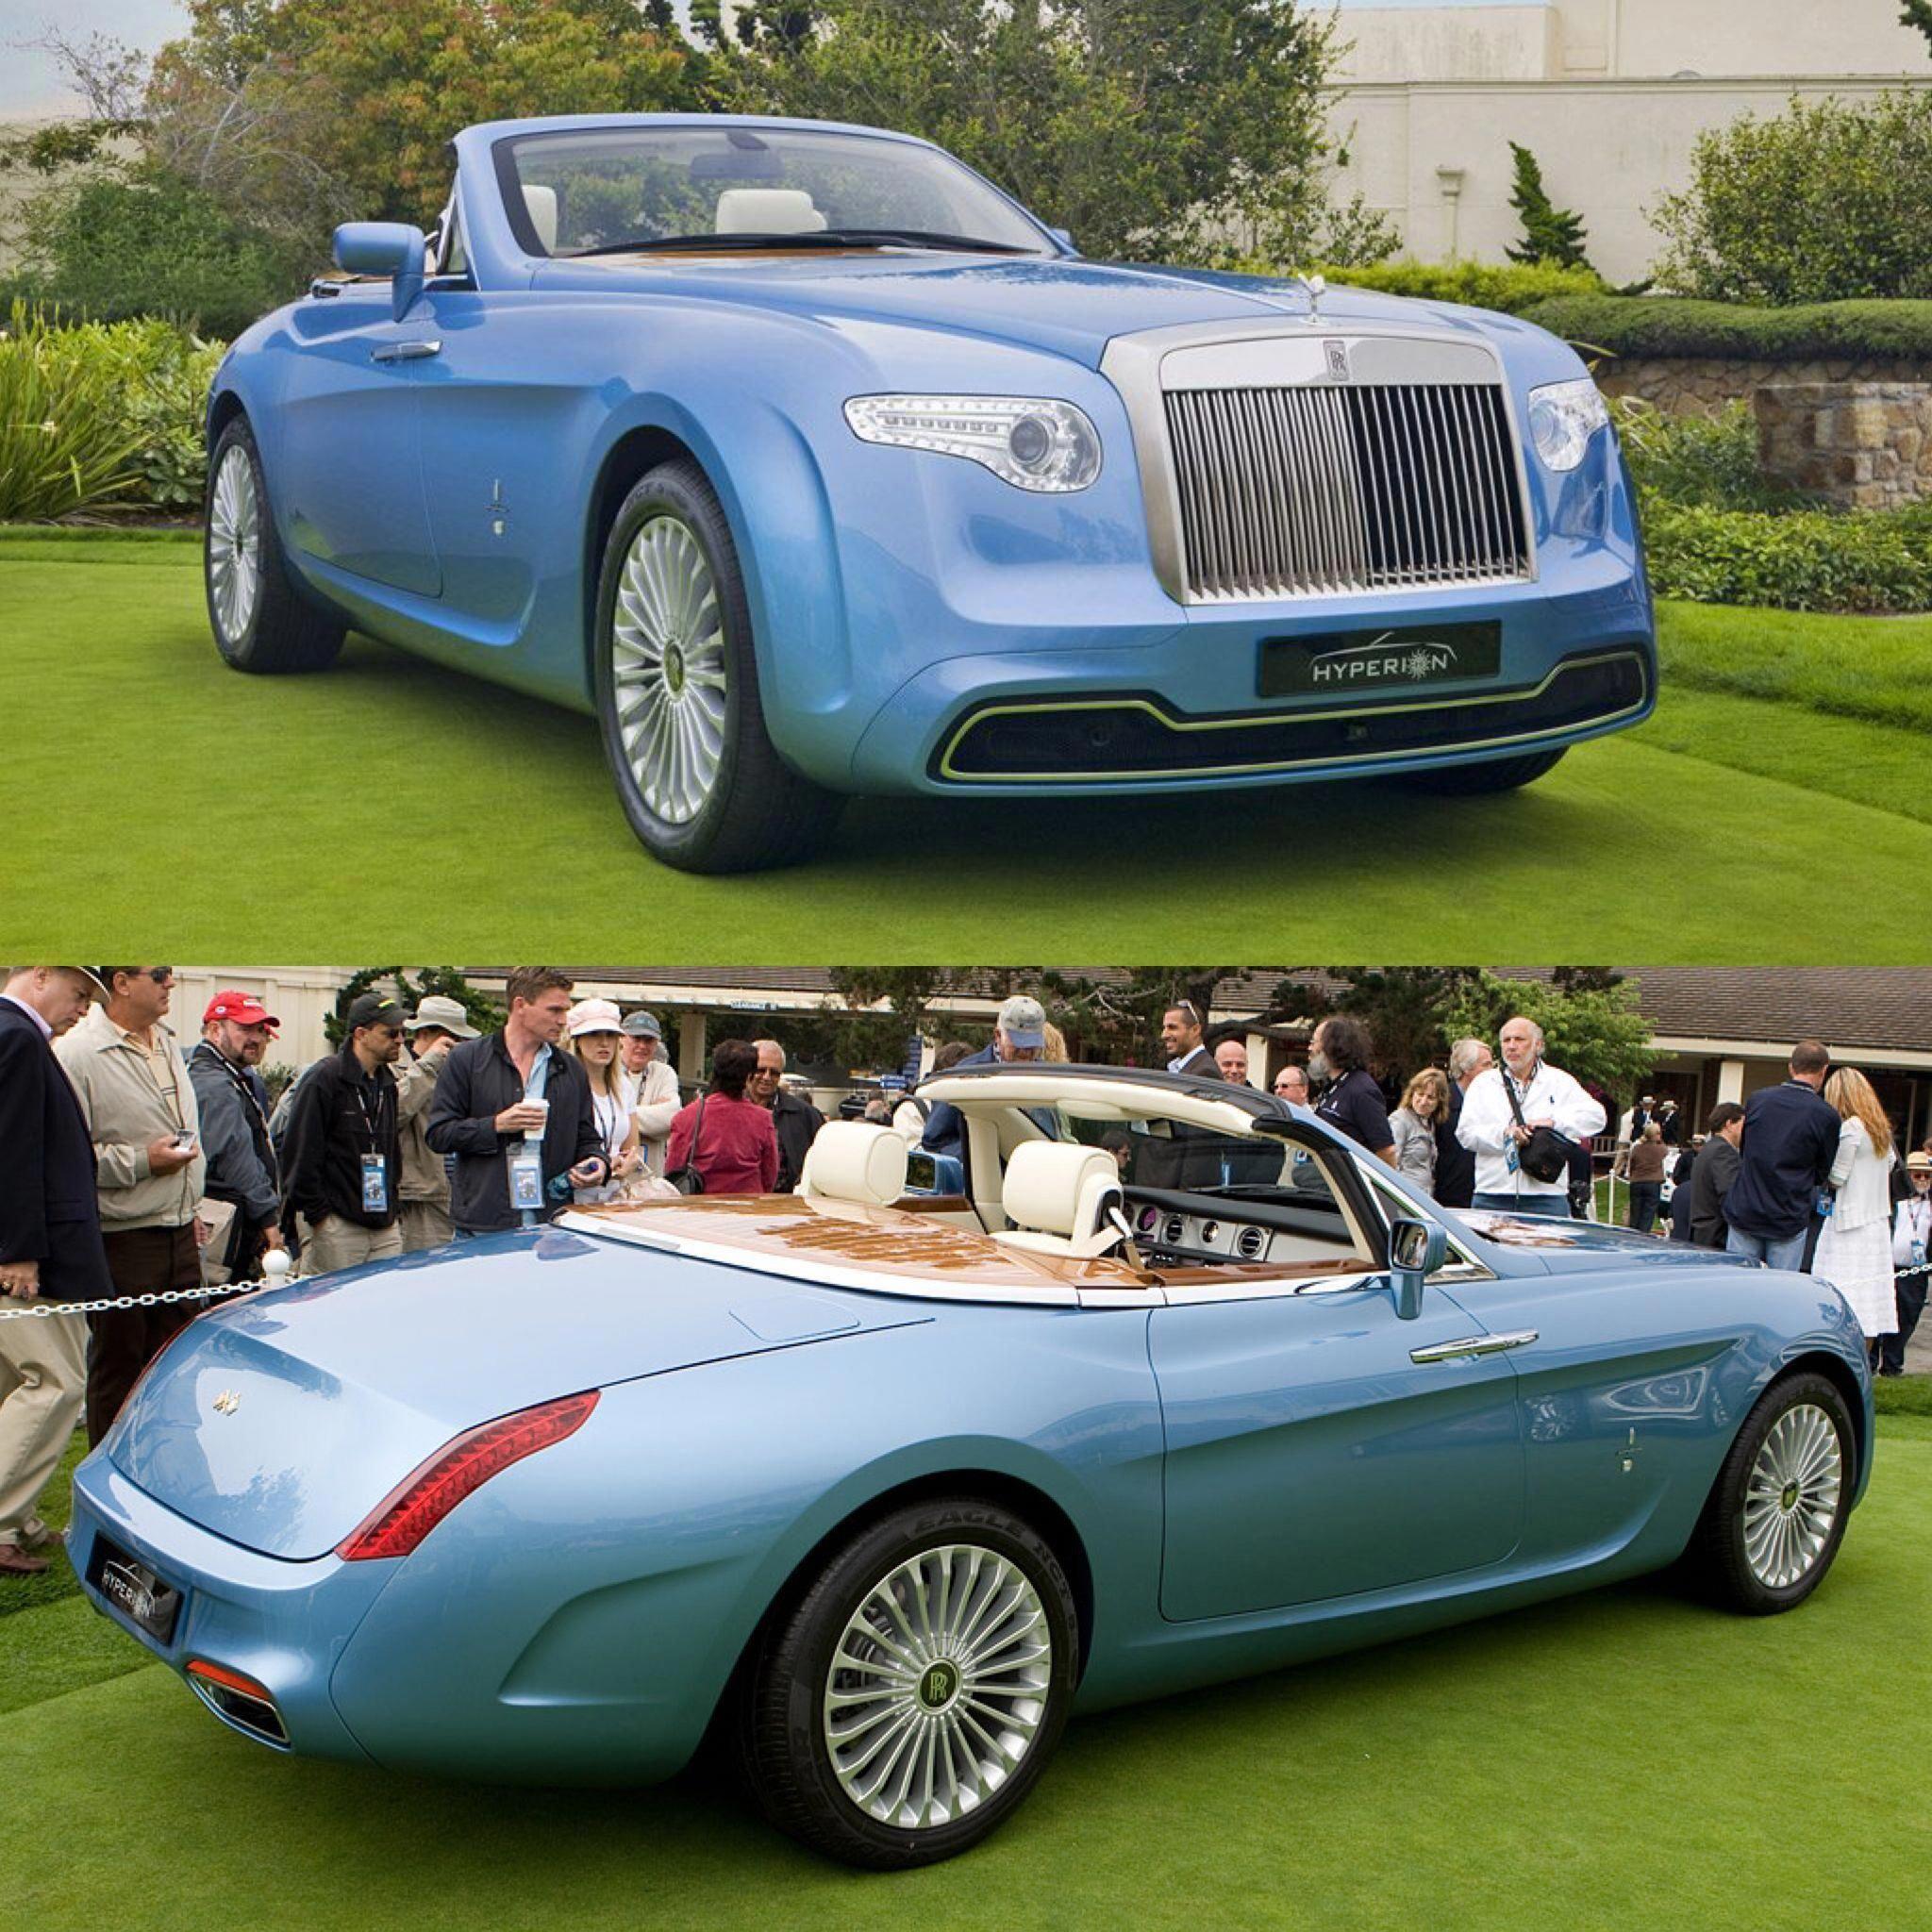 Rolls Royce Classic Cars Price #RollsRoyceClassicCars